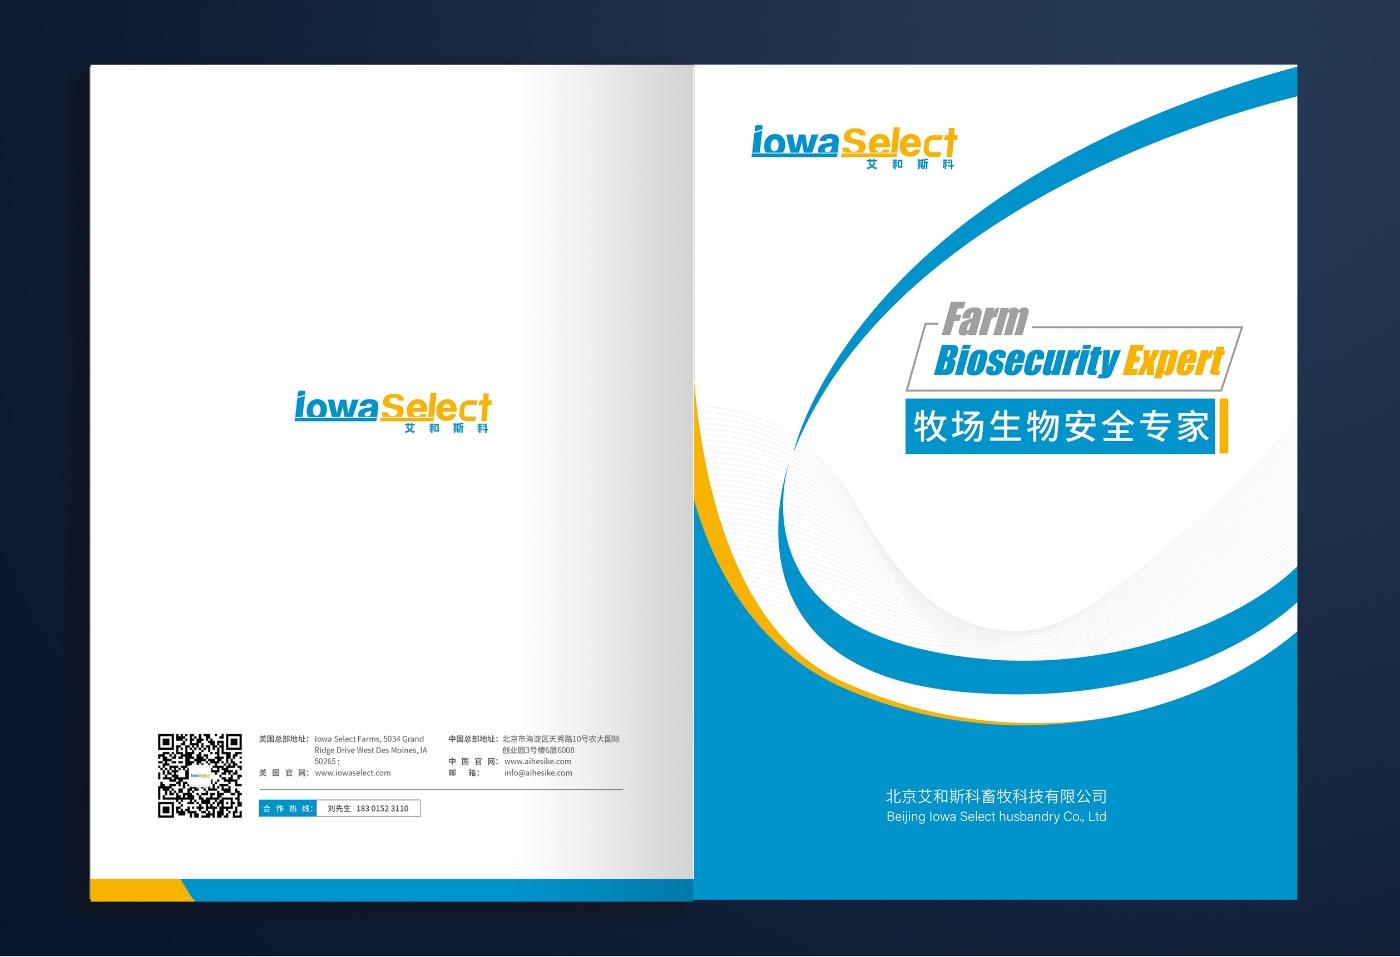 艾和斯科畜牧科技<a href='http://www.6chuangyi.com/case/wuliaosheji/' title='' style='color:;font-weight:bold'>折页设计</a>_01.jpg